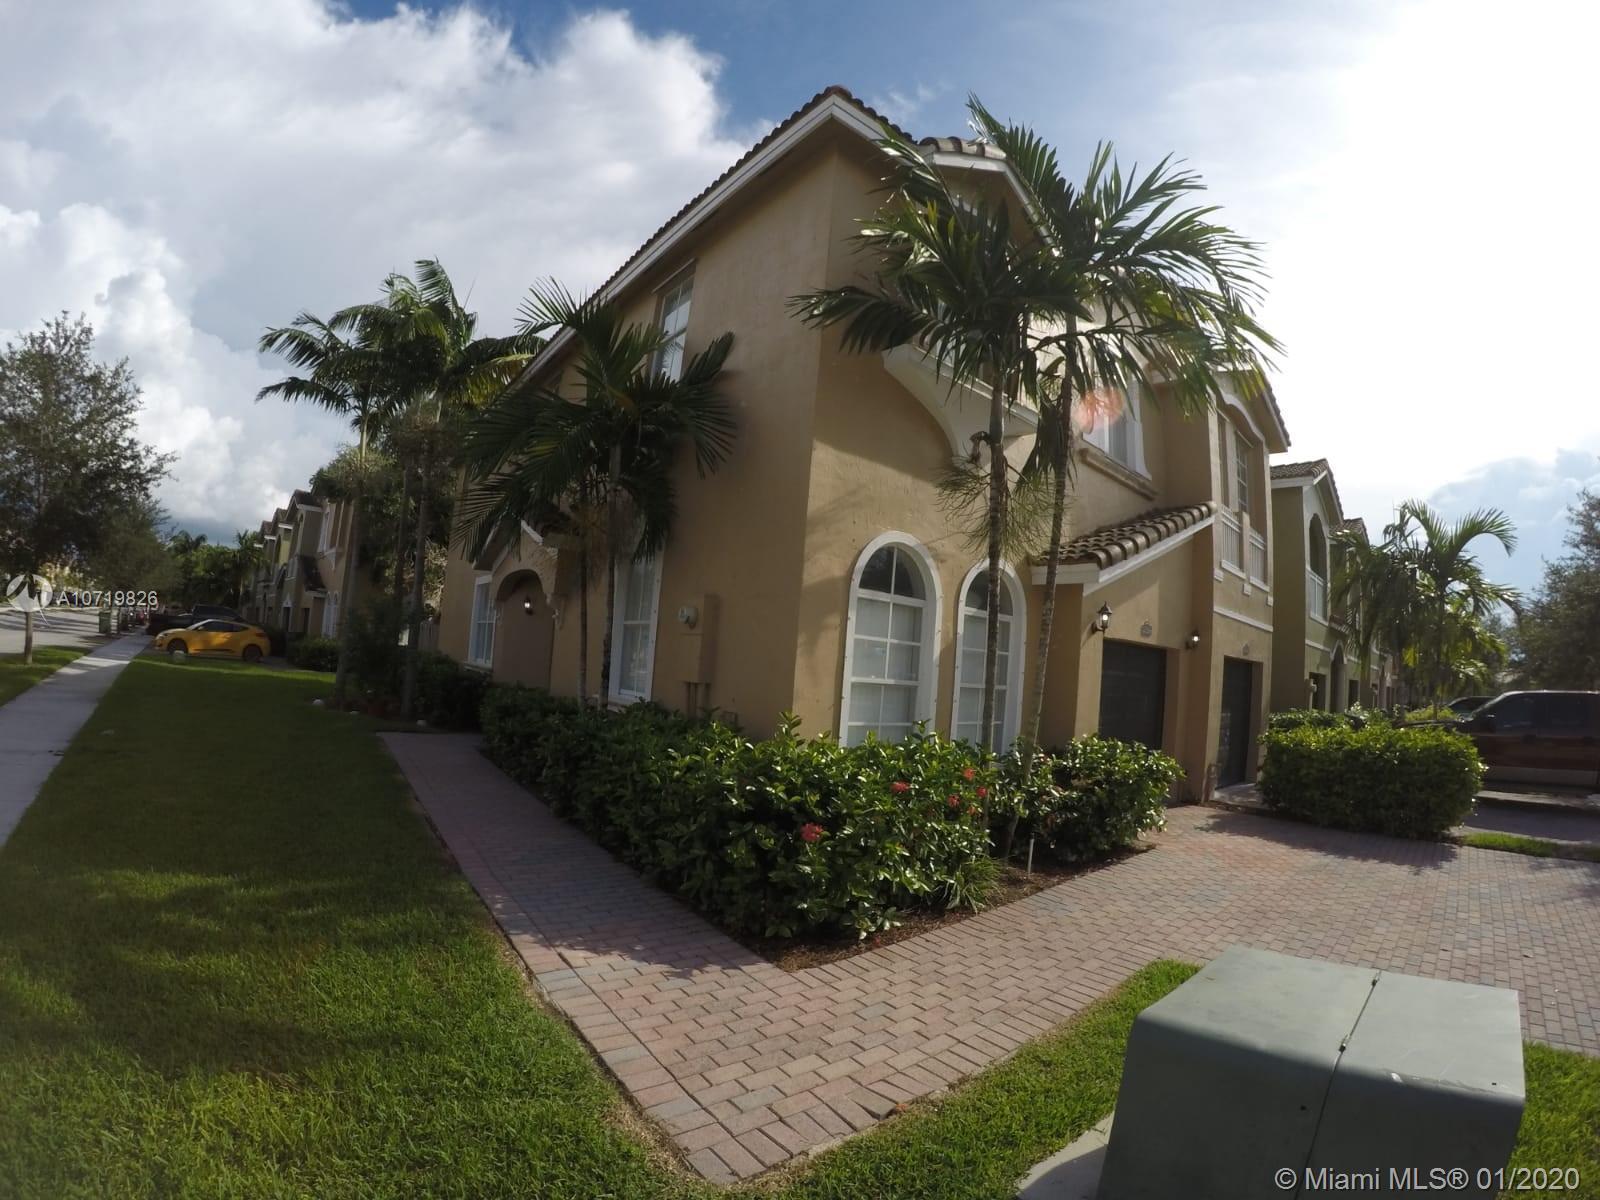 2598 SE 14th St #2598, Homestead, FL 33035 - Homestead, FL real estate listing